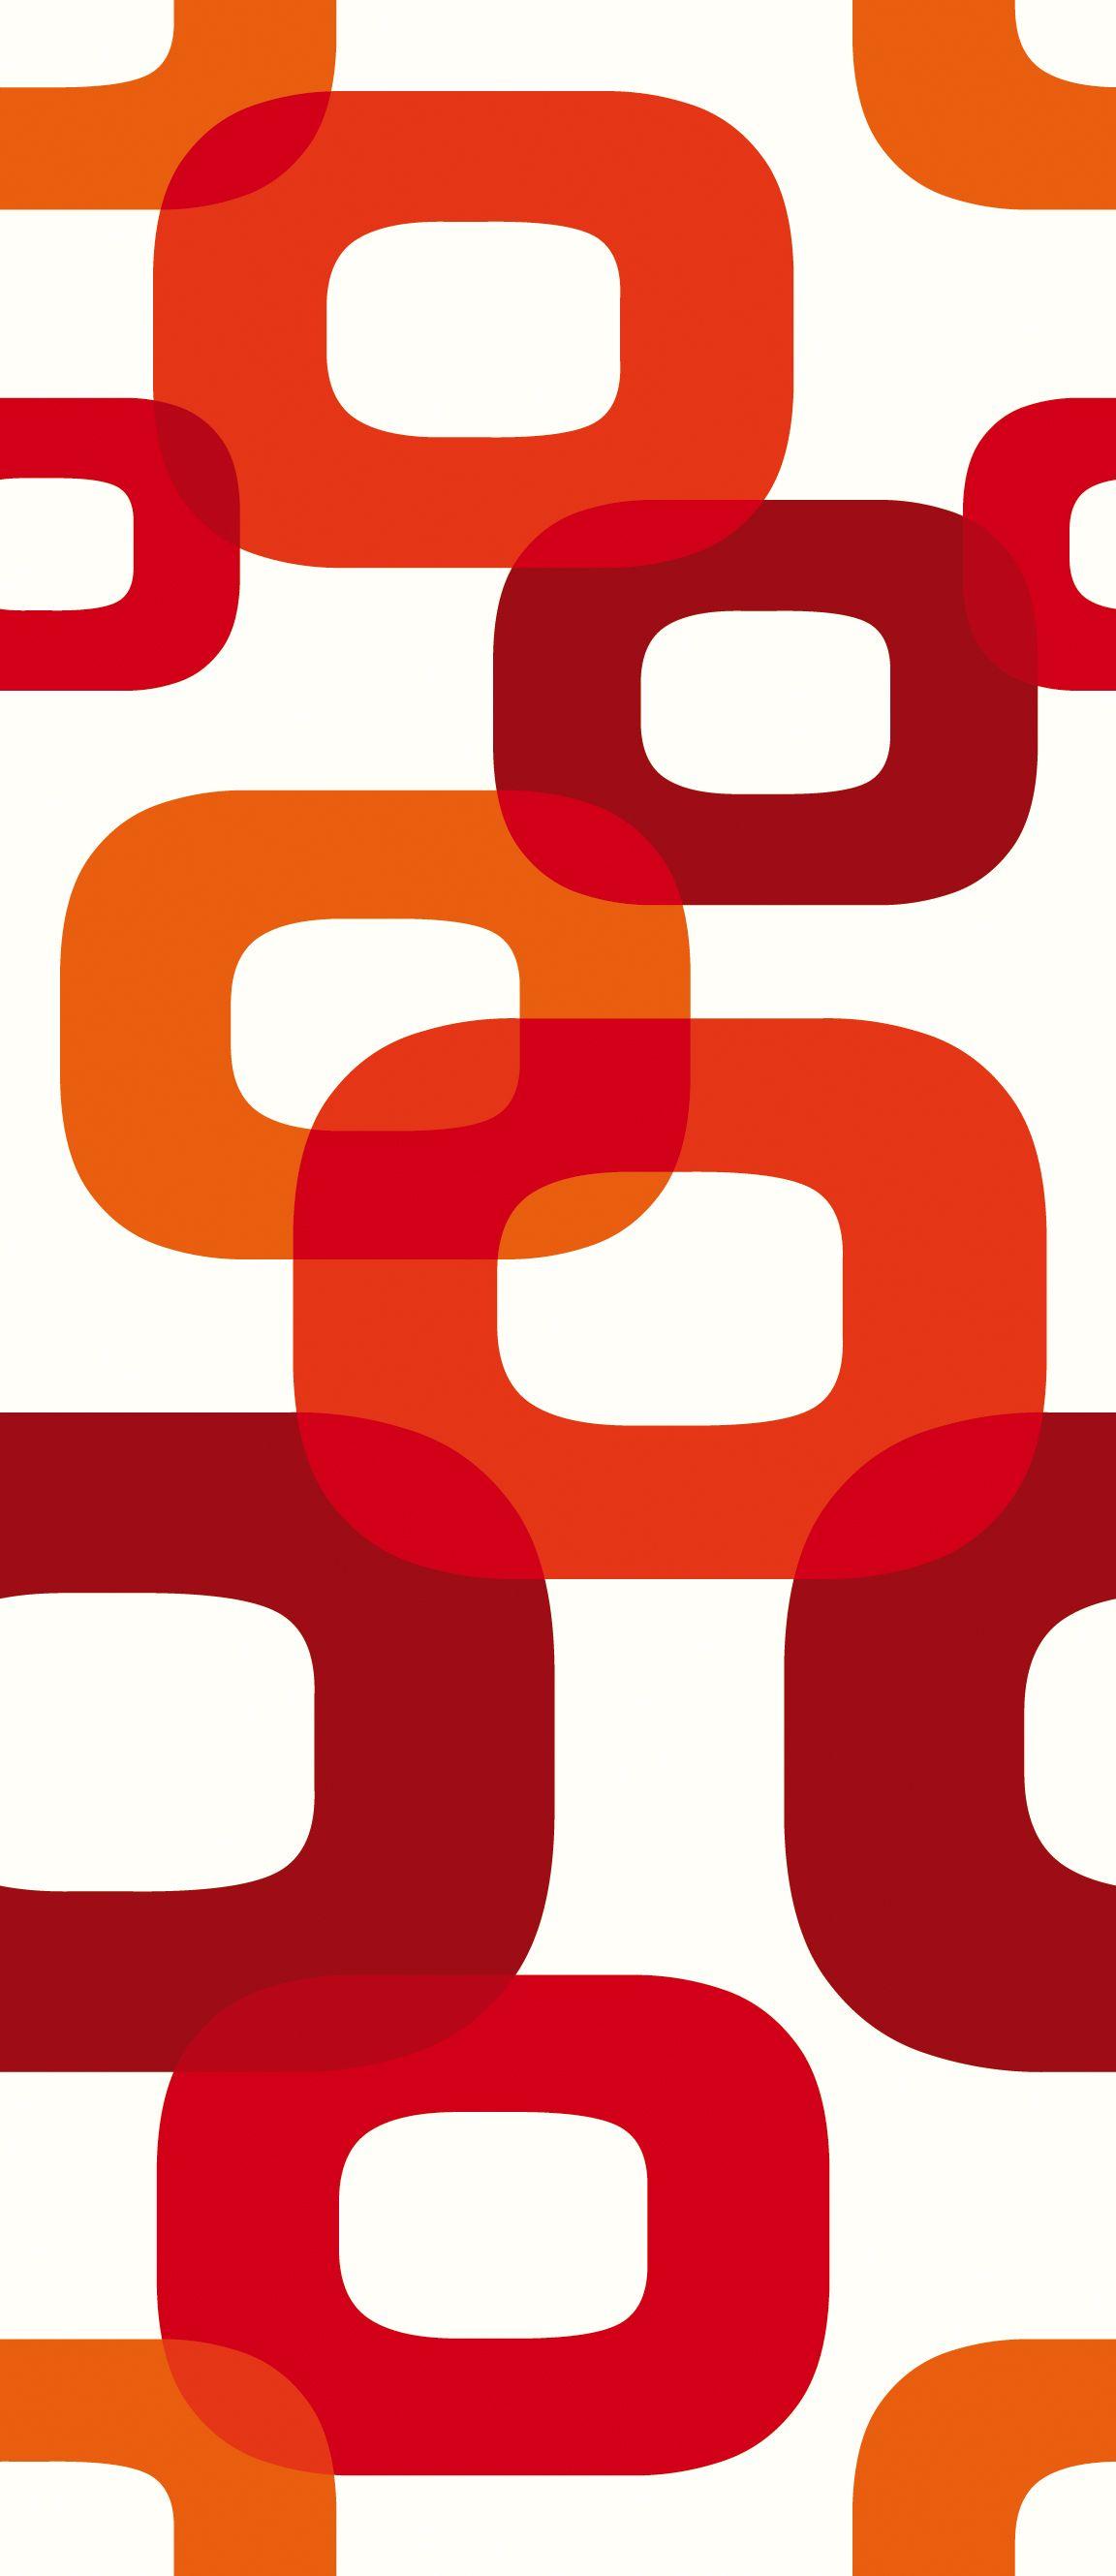 New Transparency - Cherry, wallpaper by Lars Contzen | Prints ...